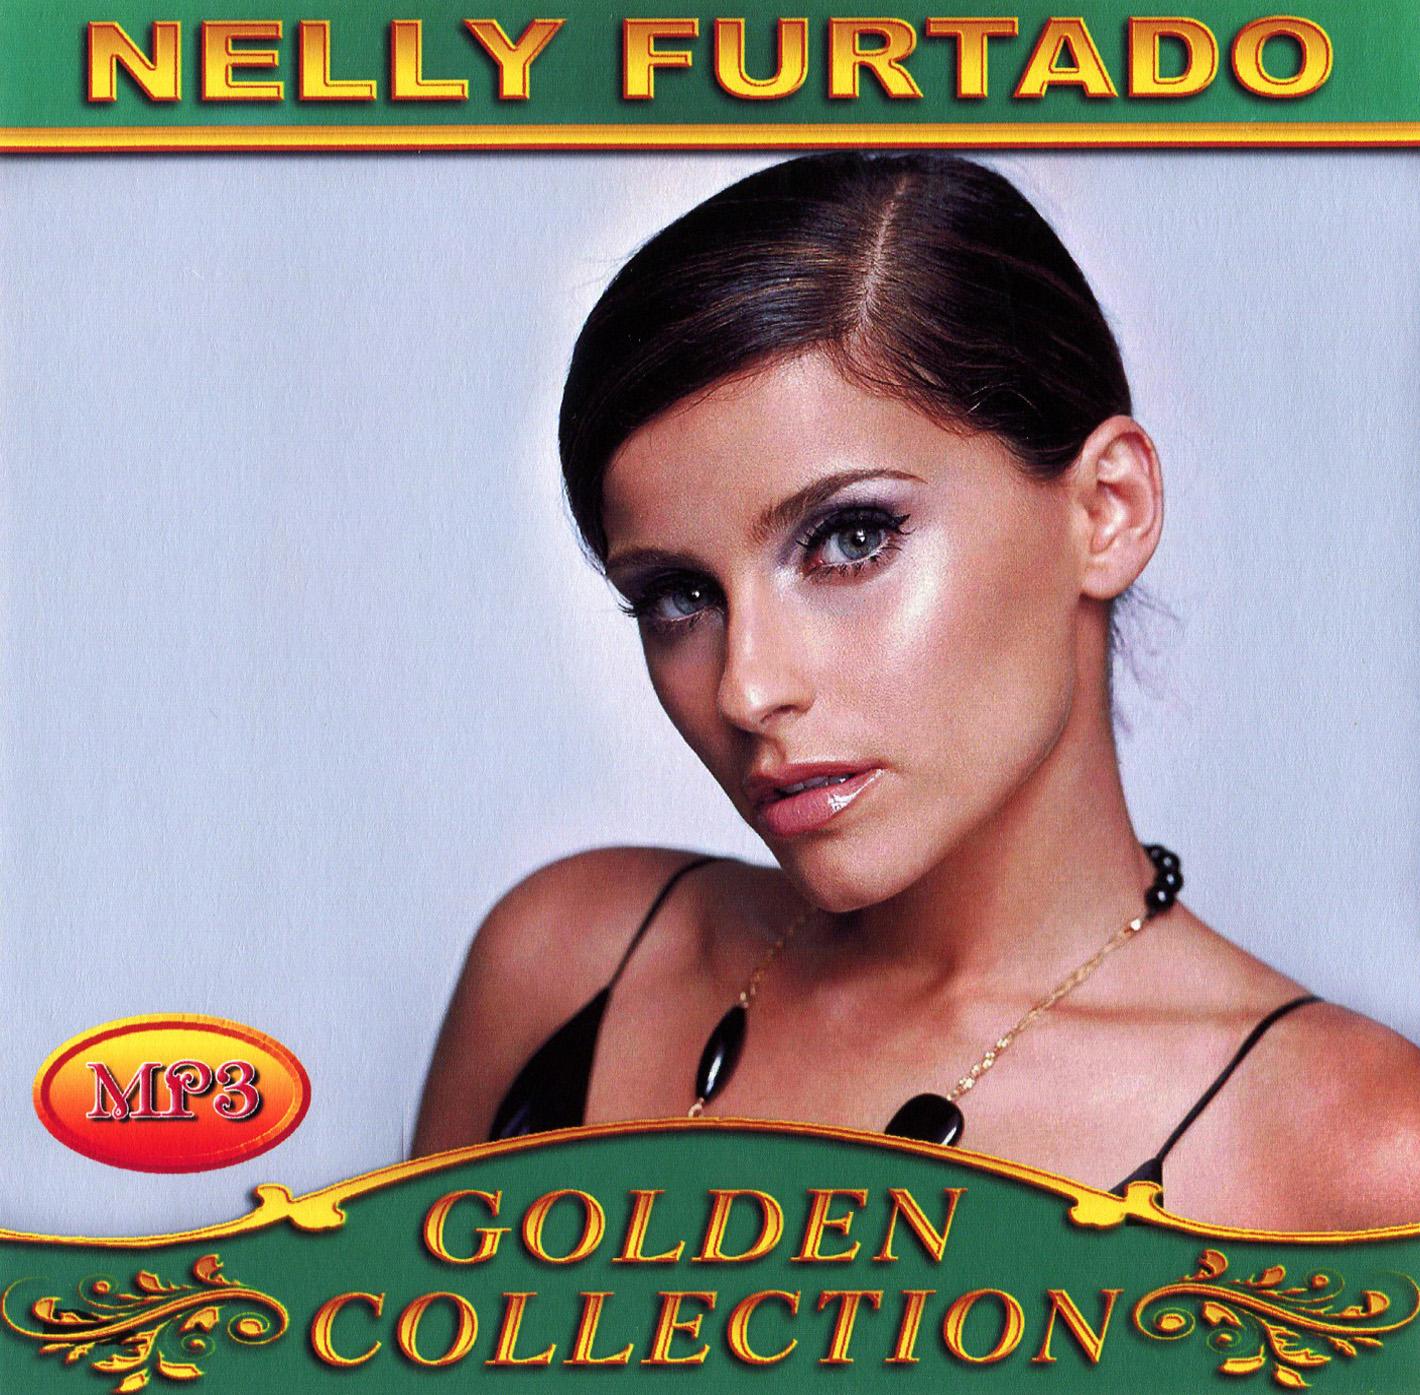 Nelly Furtado [mp3]